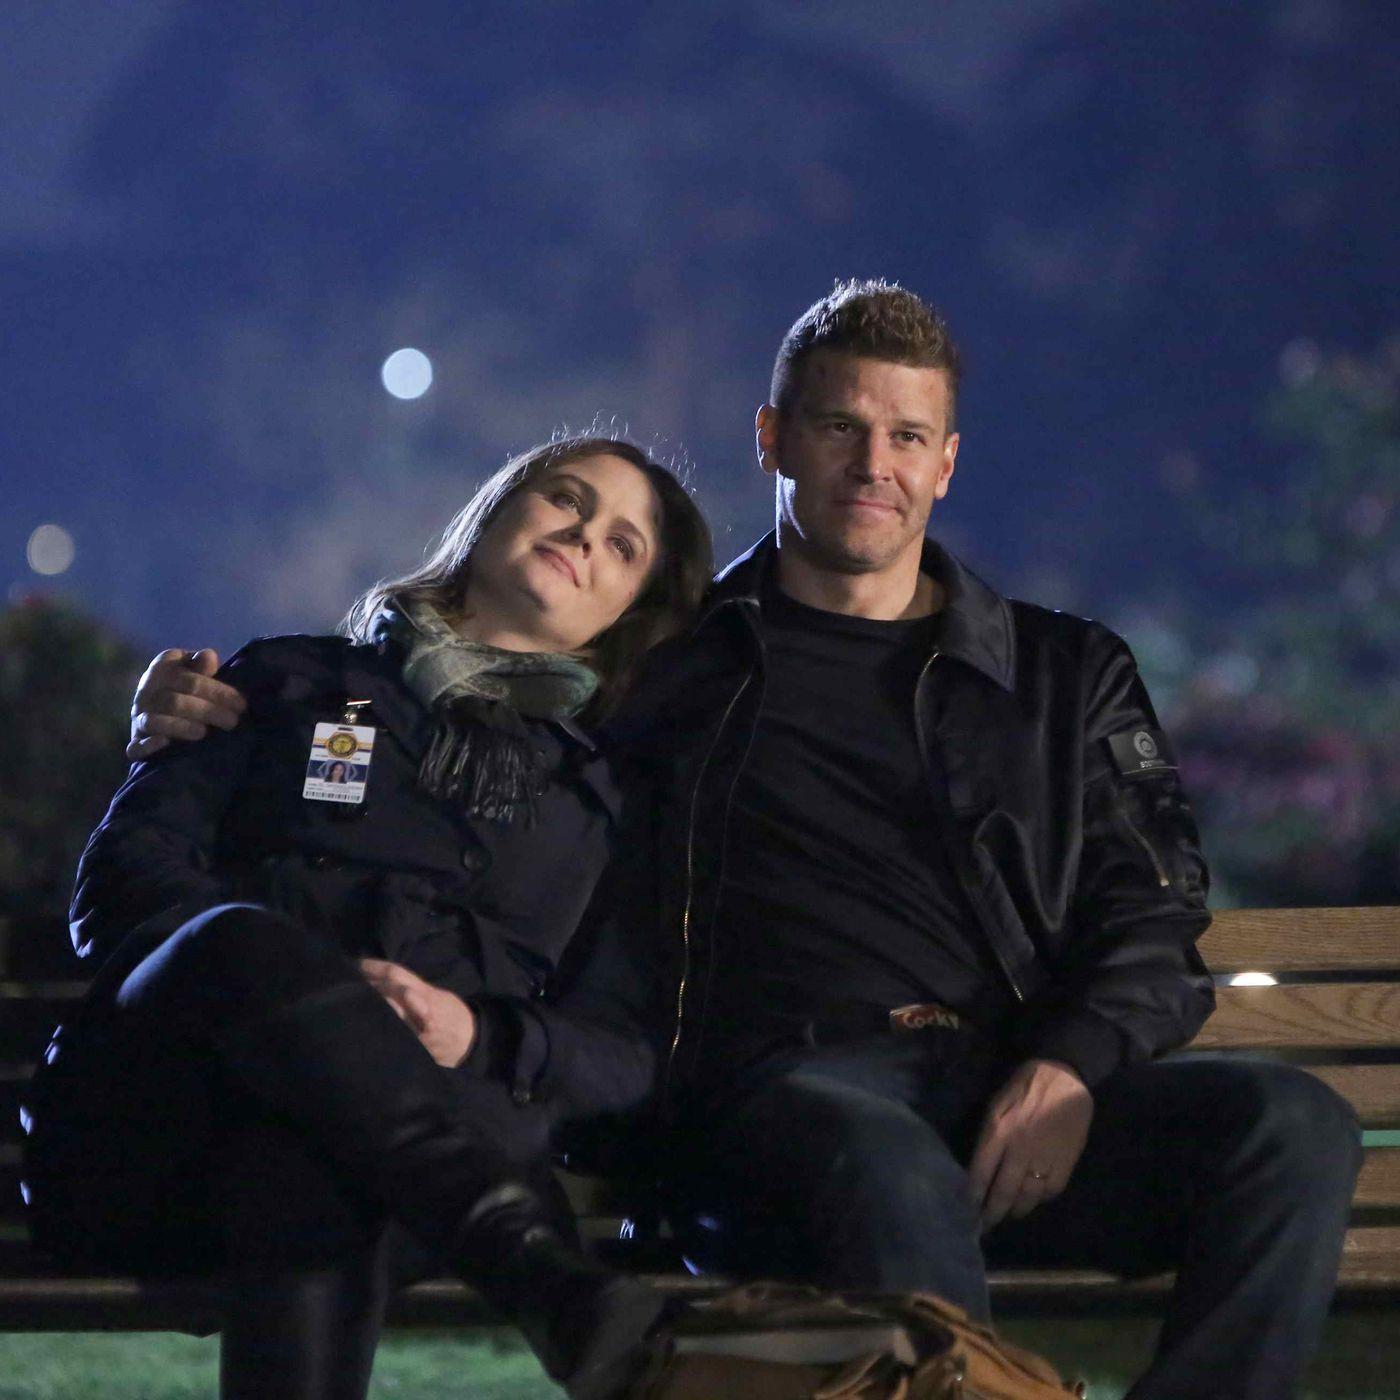 bones season 12 episode 6 watch online free